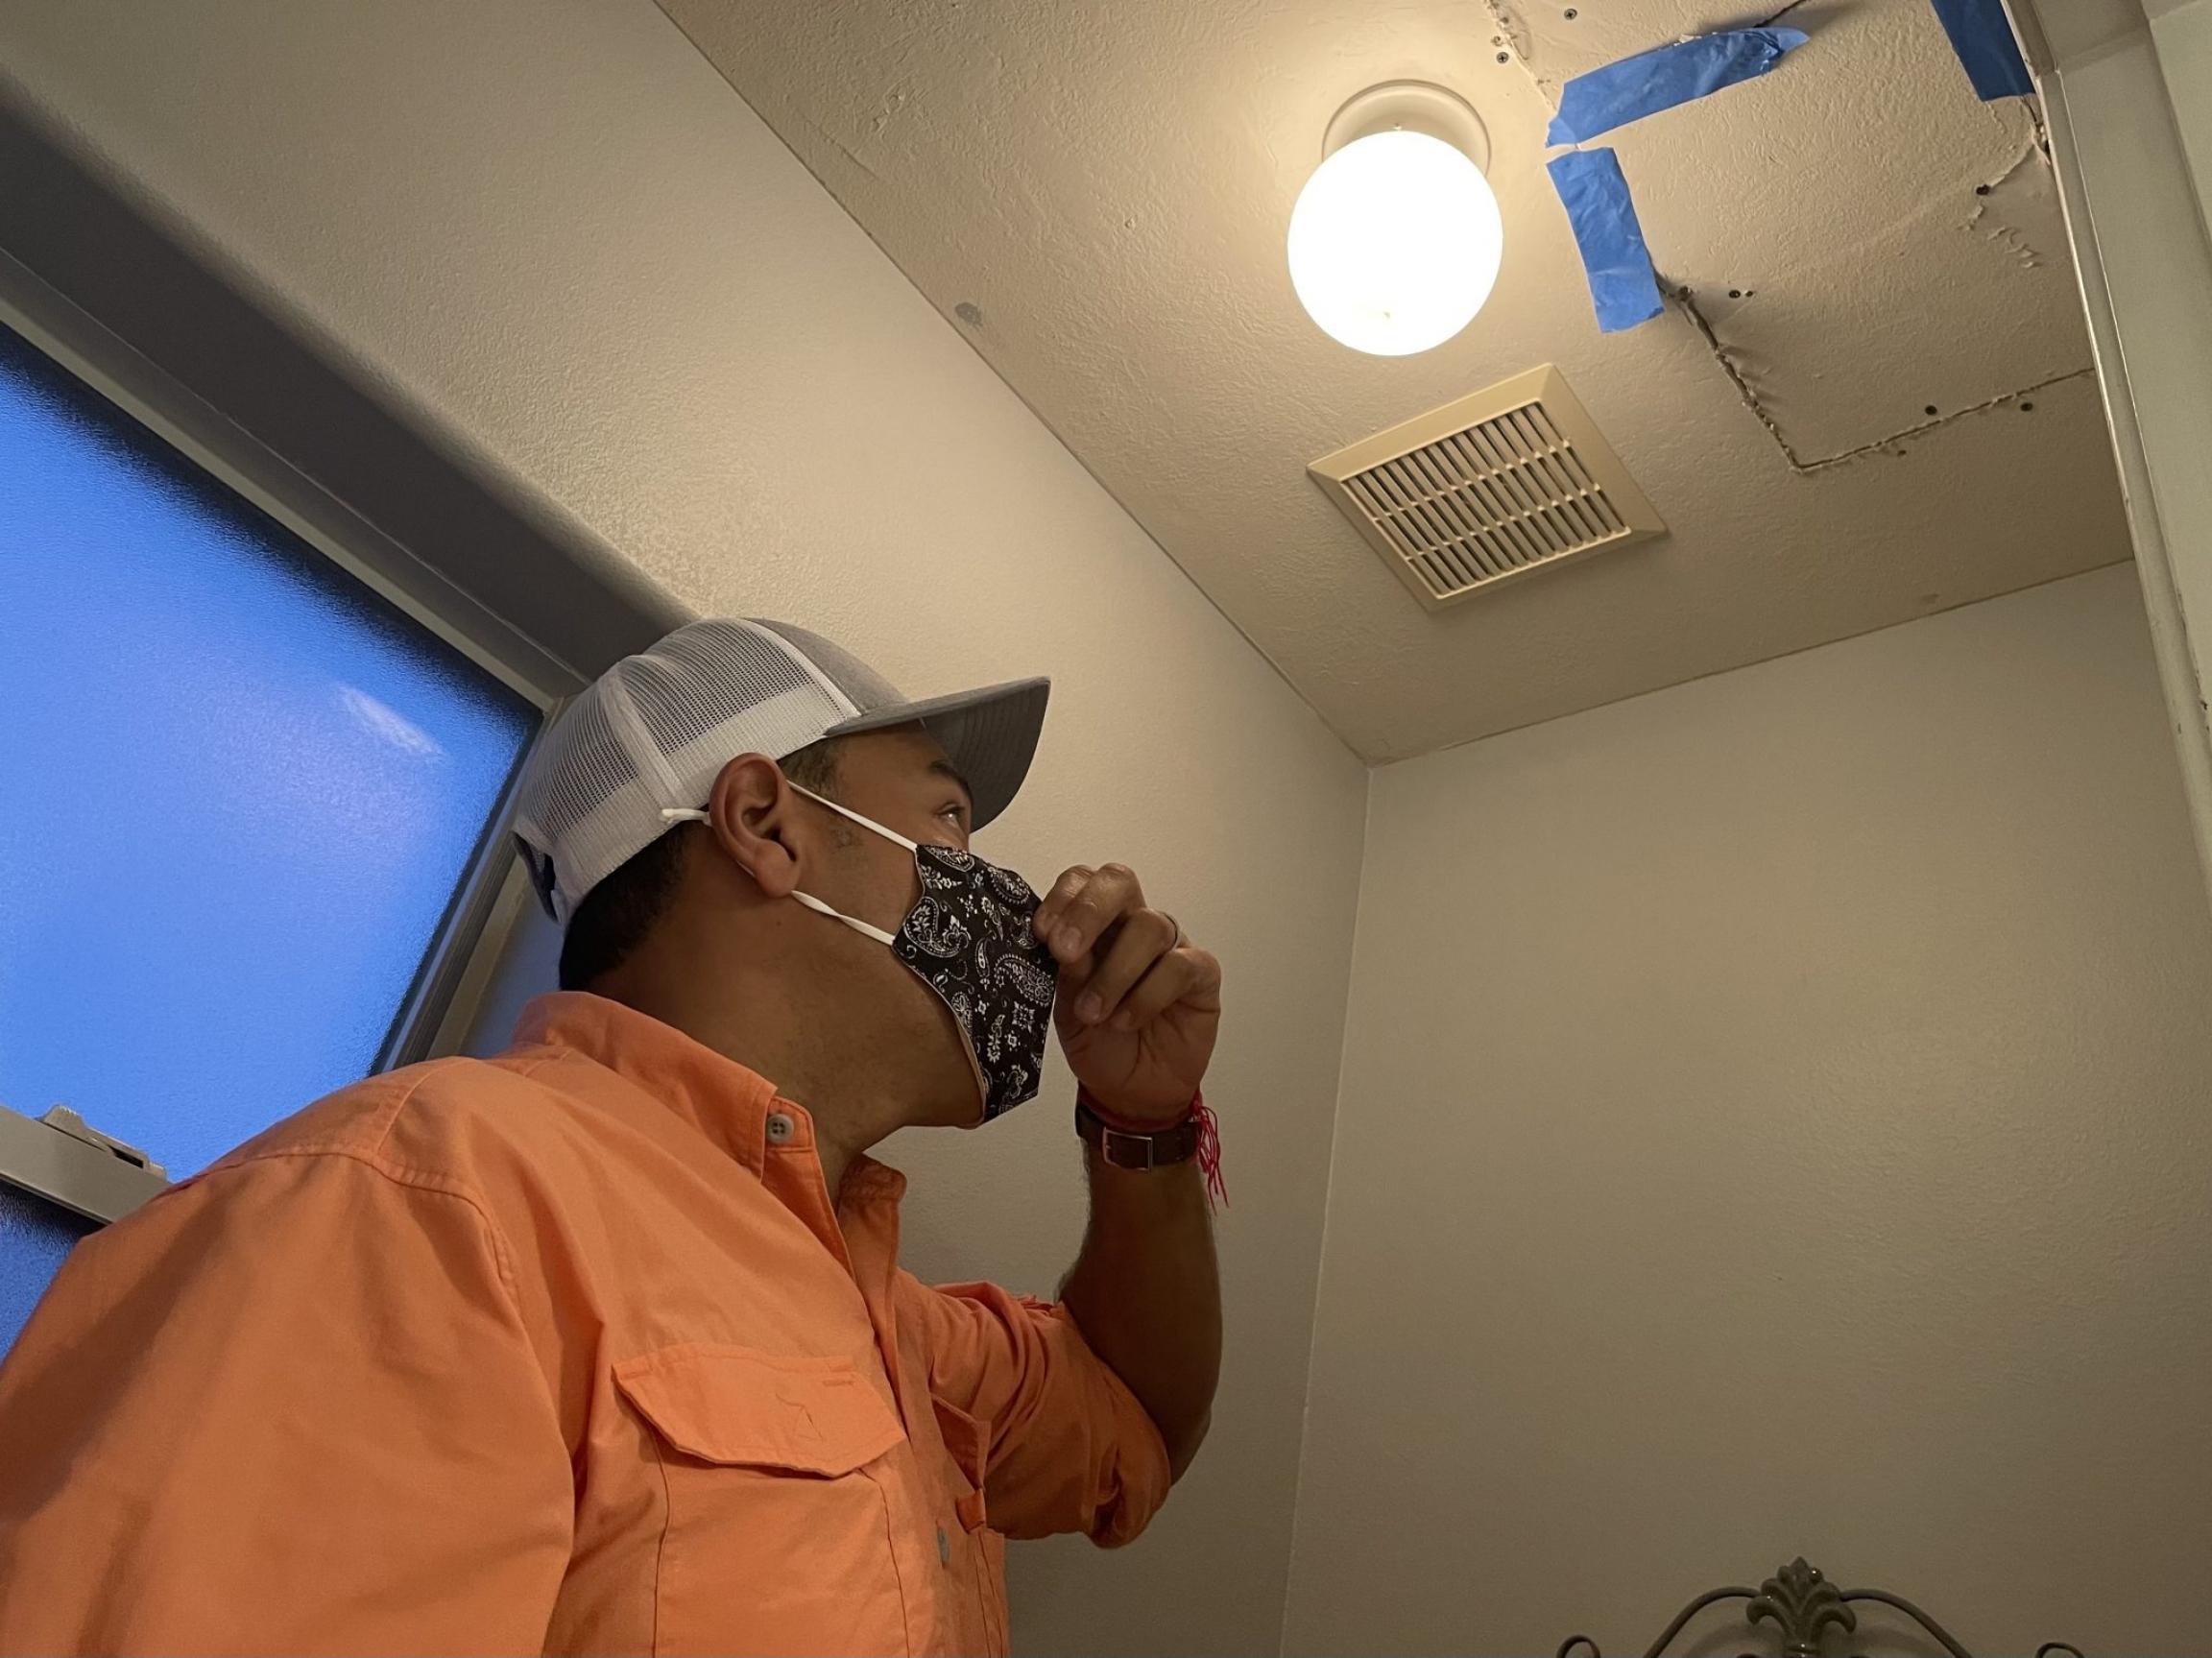 Houston plumber Eduardo Dolande shows where pipes burst inside his own home during the Texas freeze.